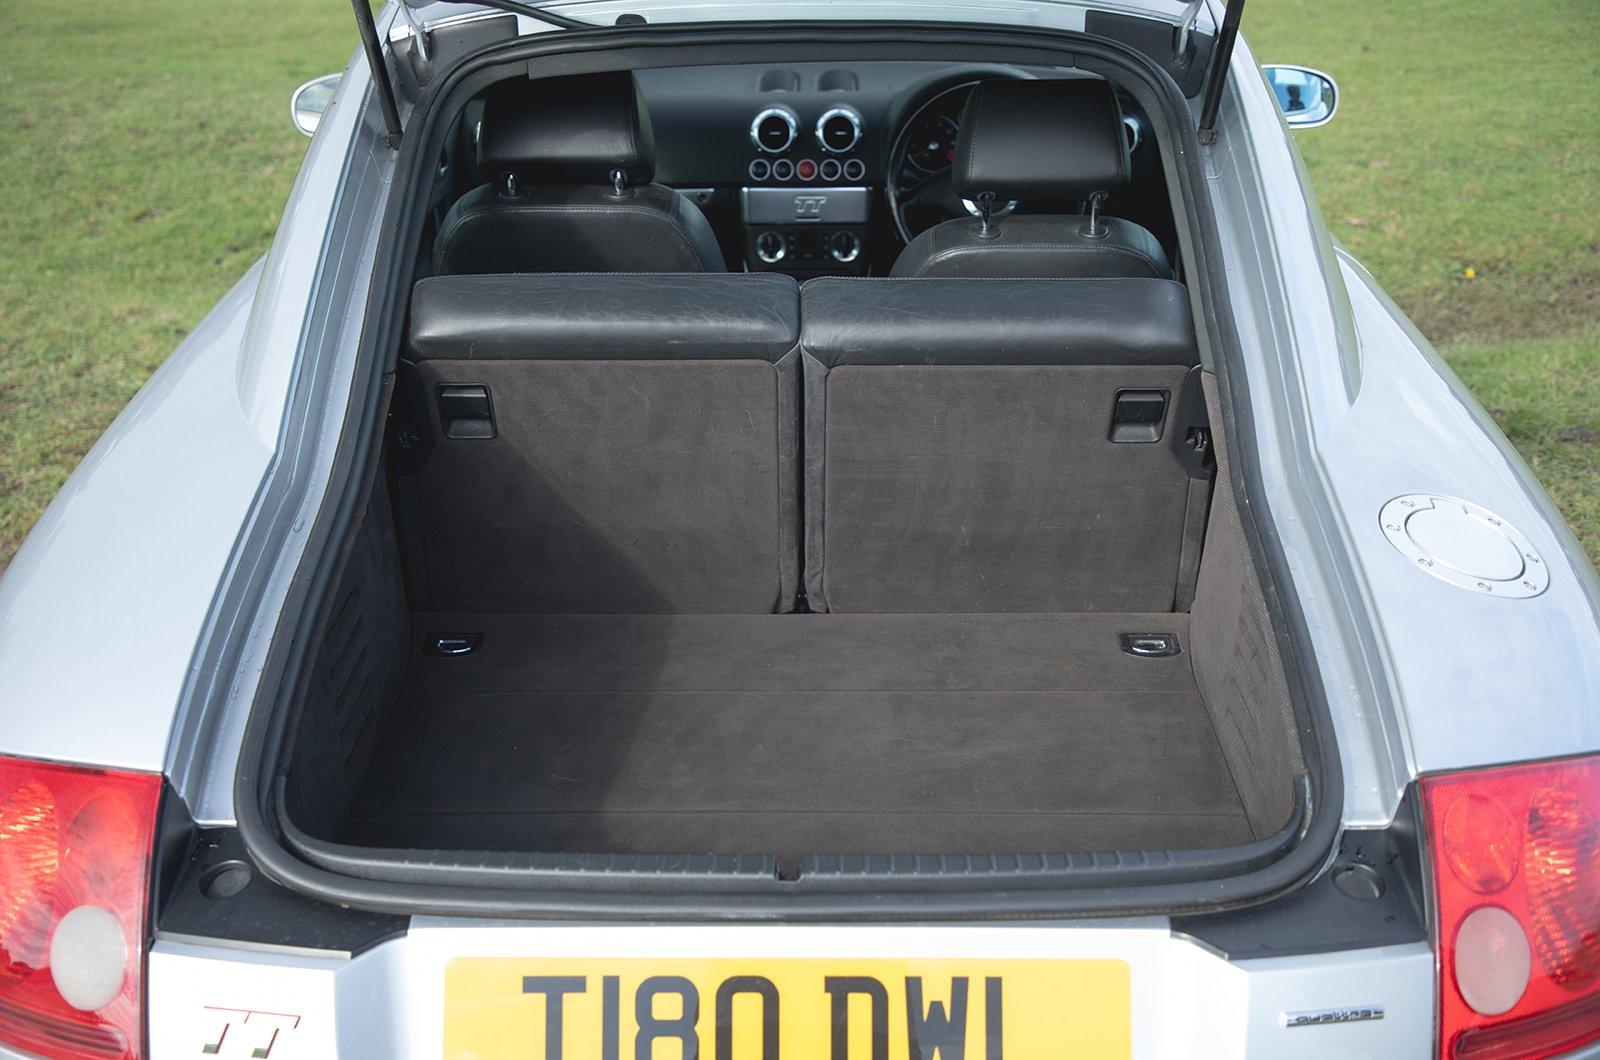 Audi TT 1999 boot